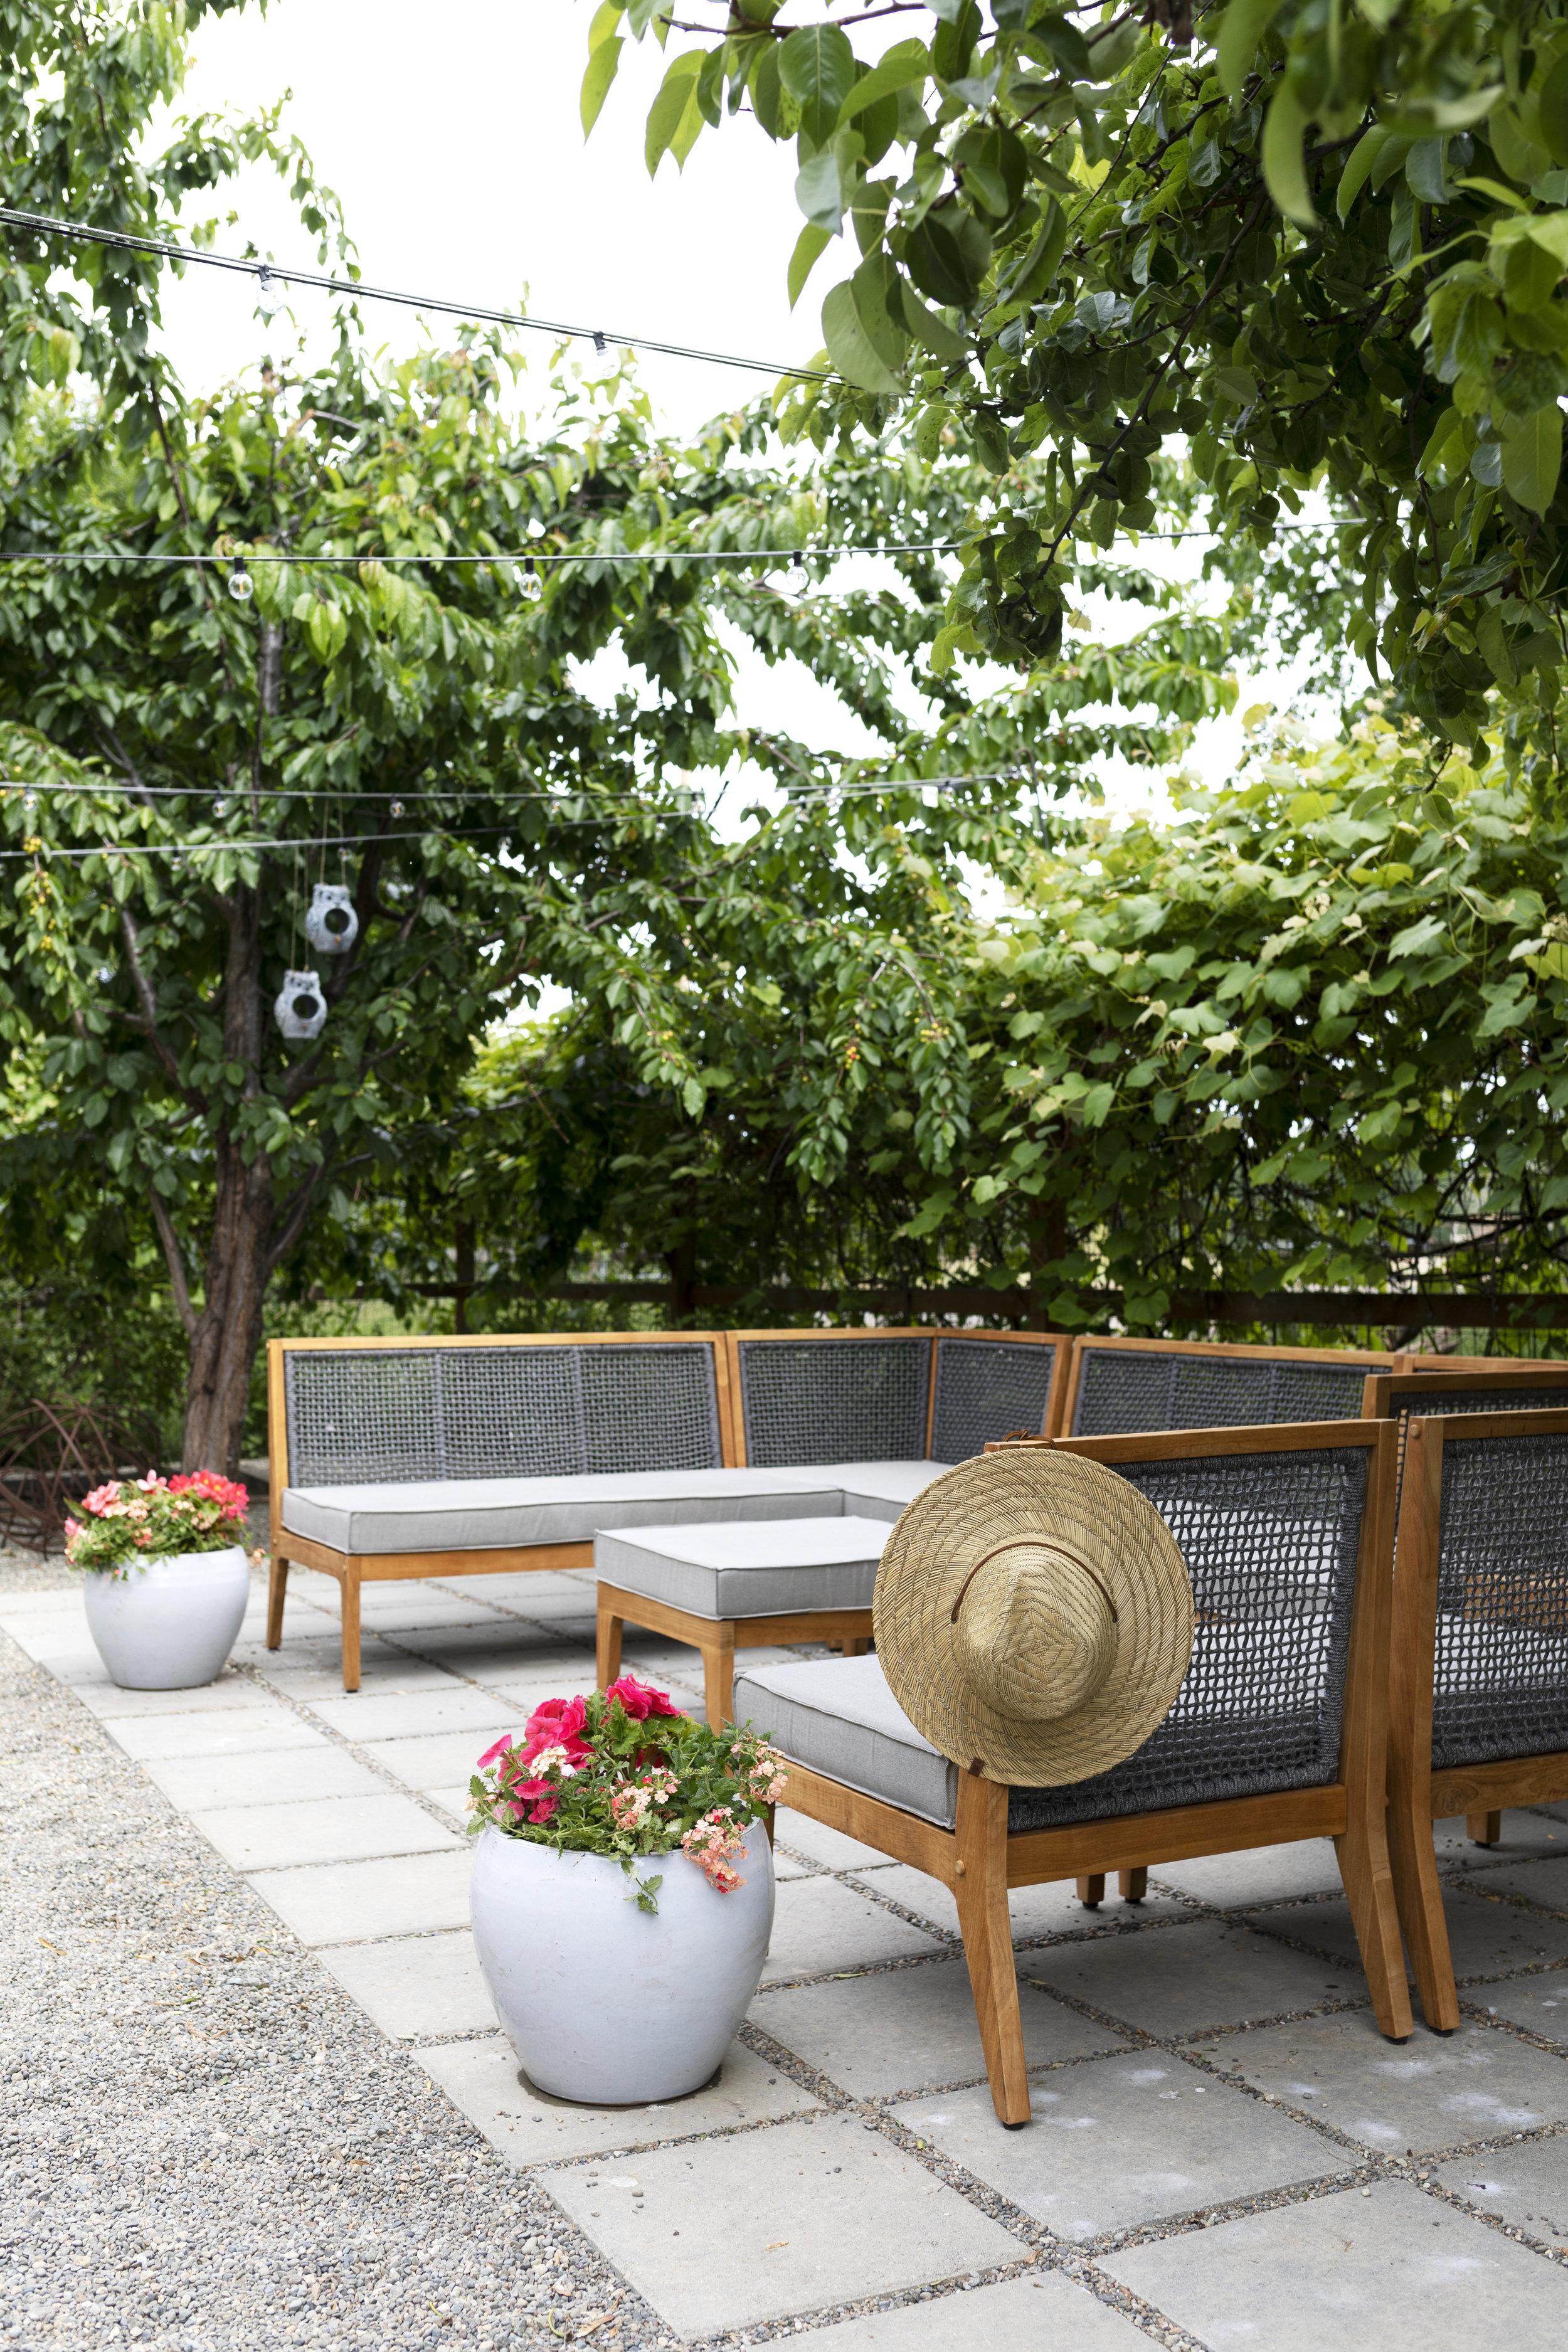 The Grit and Polish - Farmhouse Garden Patio Furniture 7.jpg